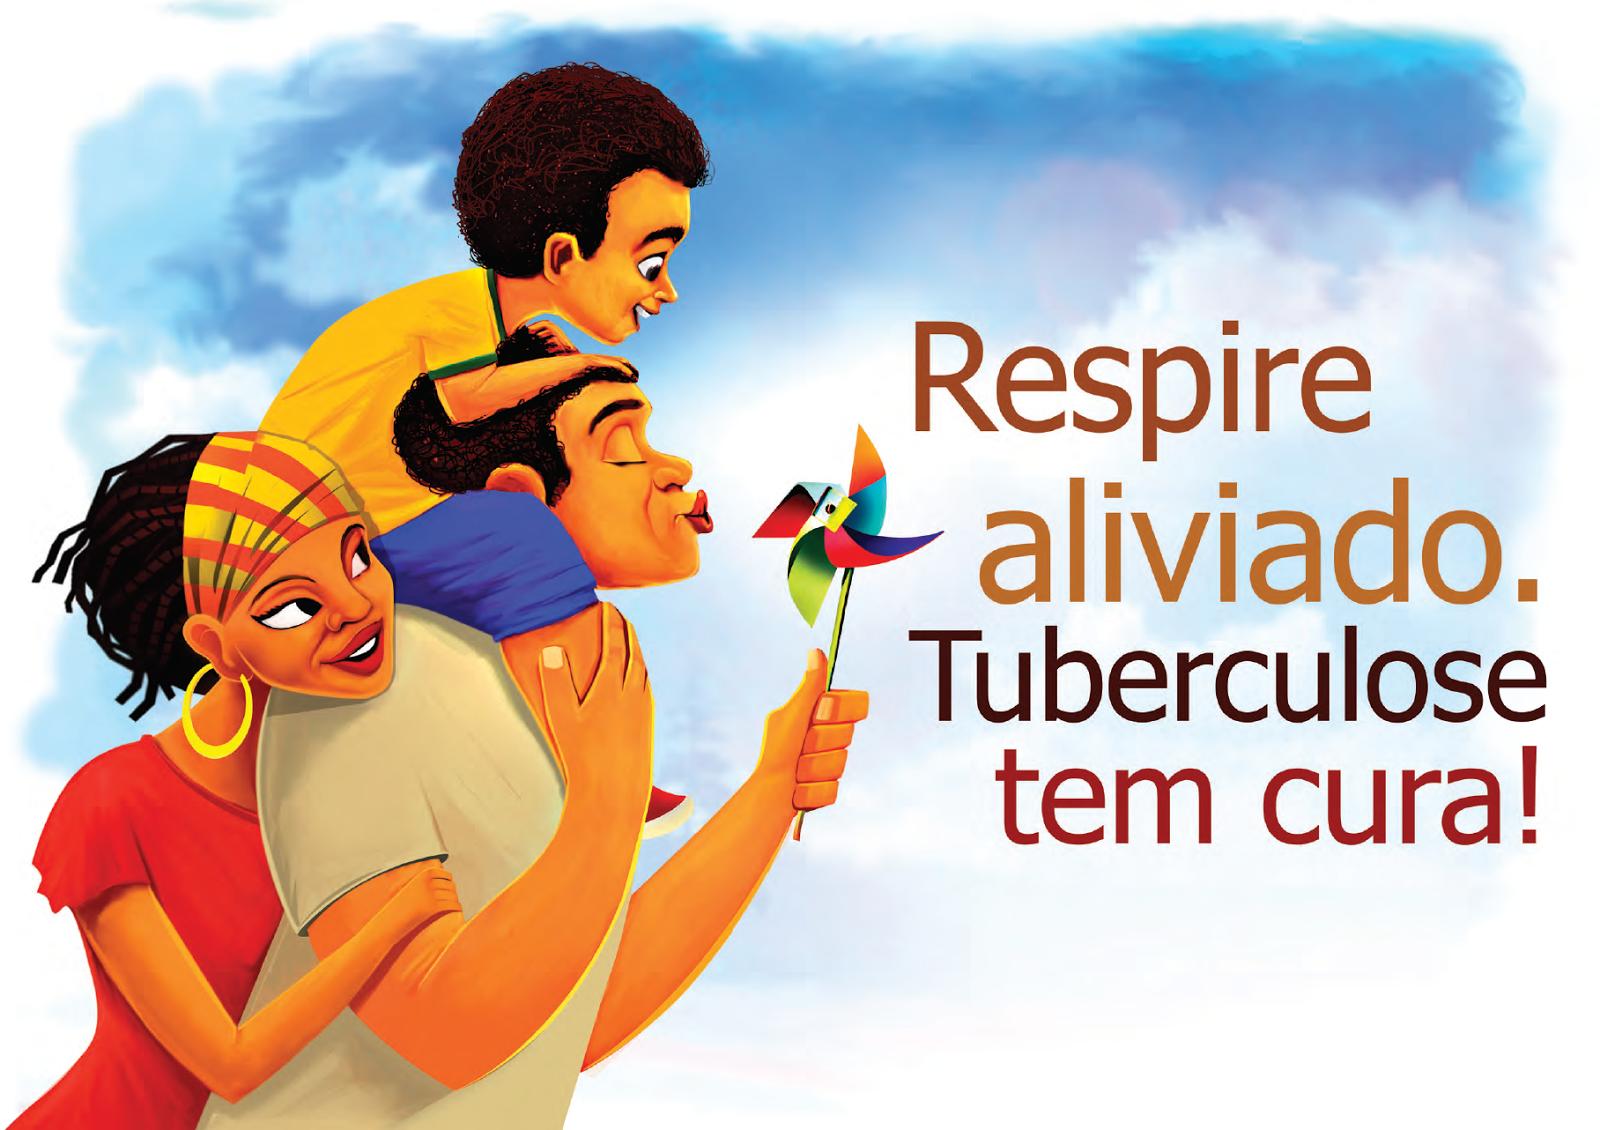 Tuberculose tem cura.